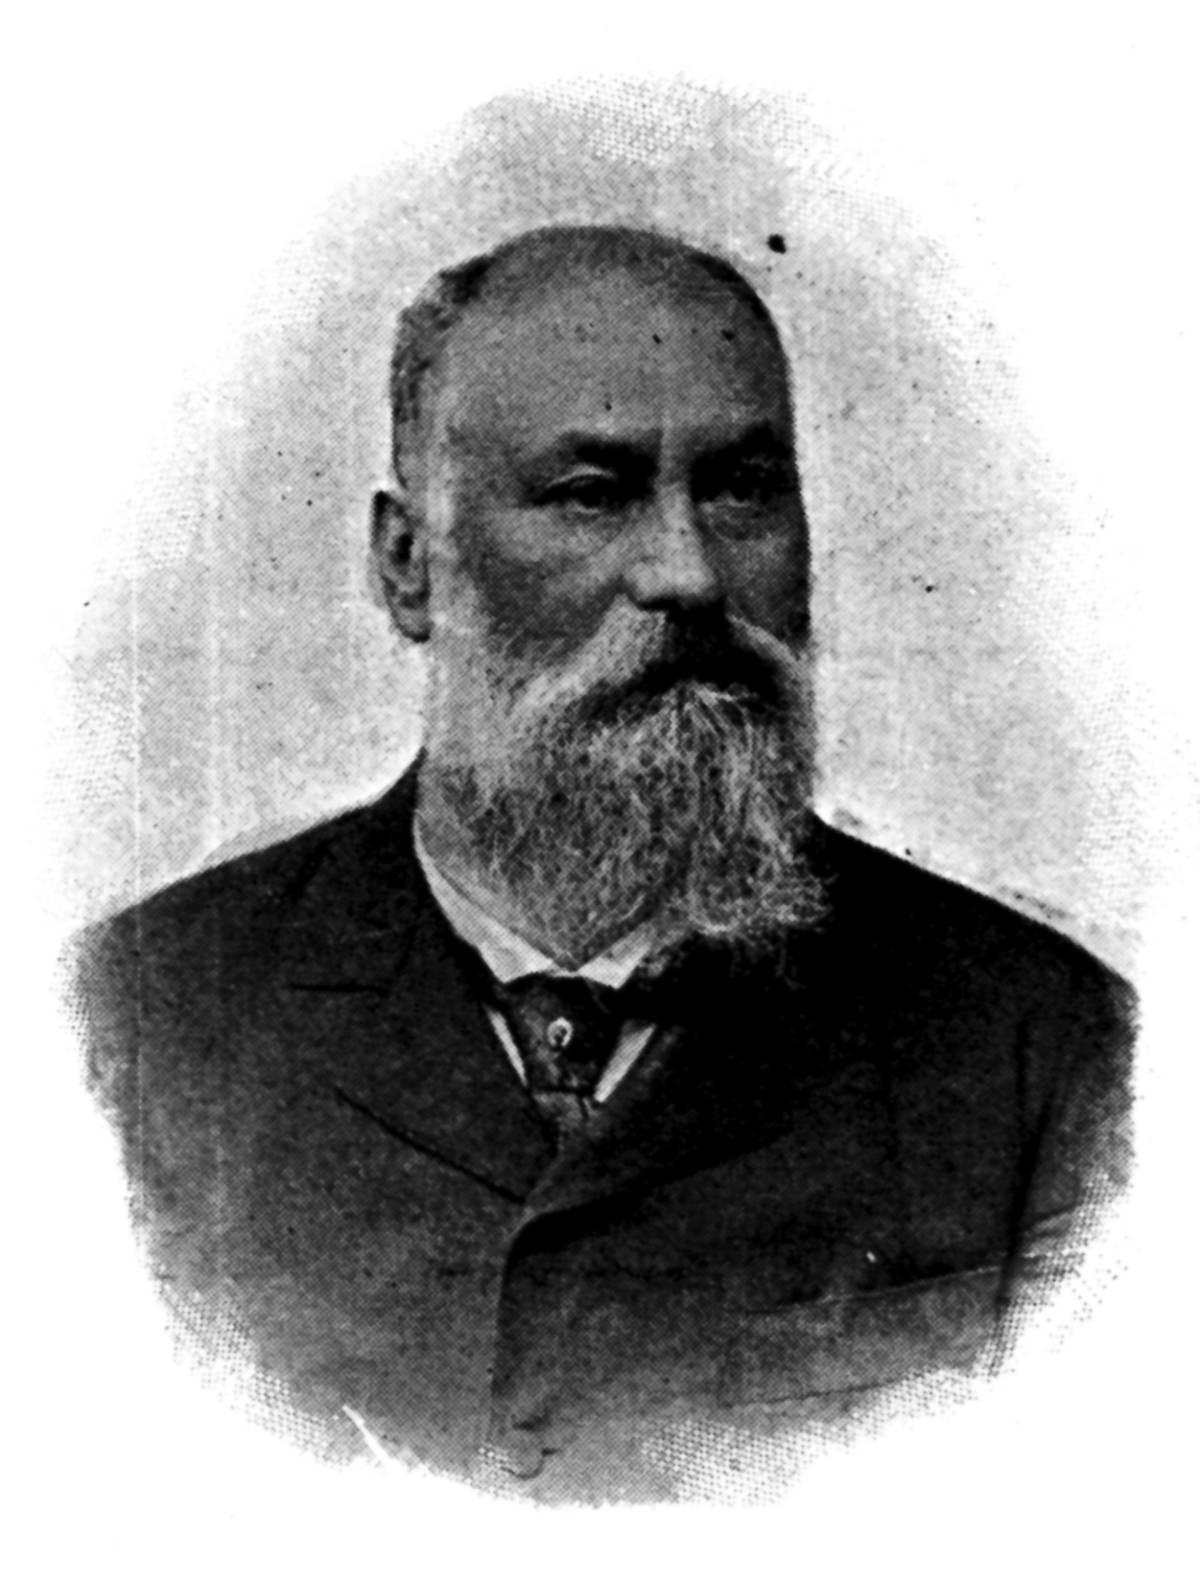 Image of Sigmund Exner from Wikidata